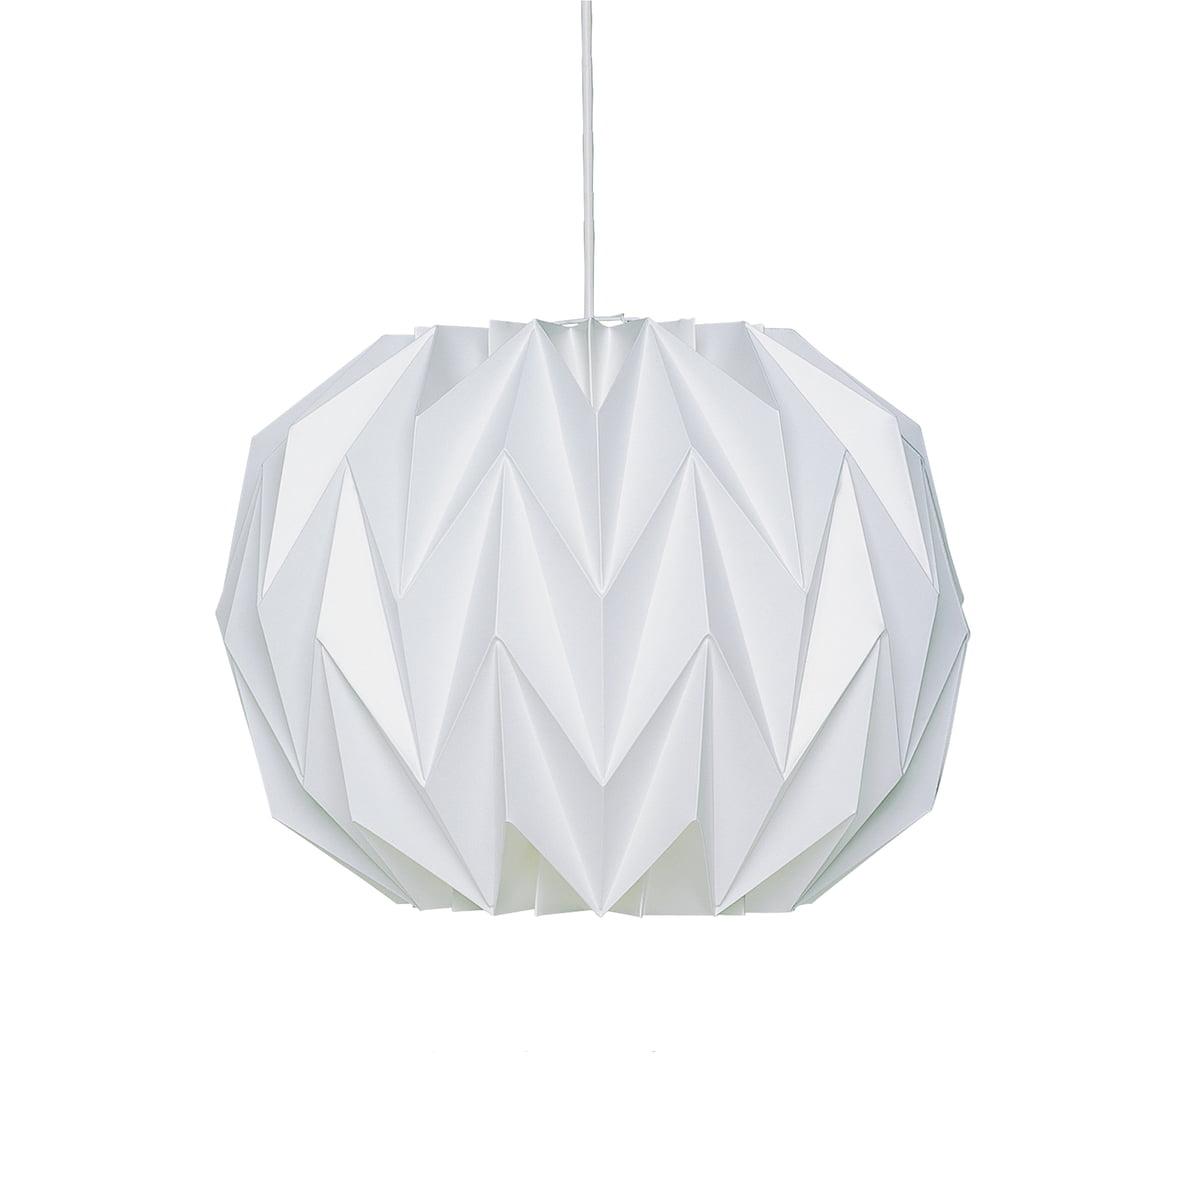 klint lighting. 157C Pendant Lamp Ø 36 Cm By Le Klint Klint Lighting A